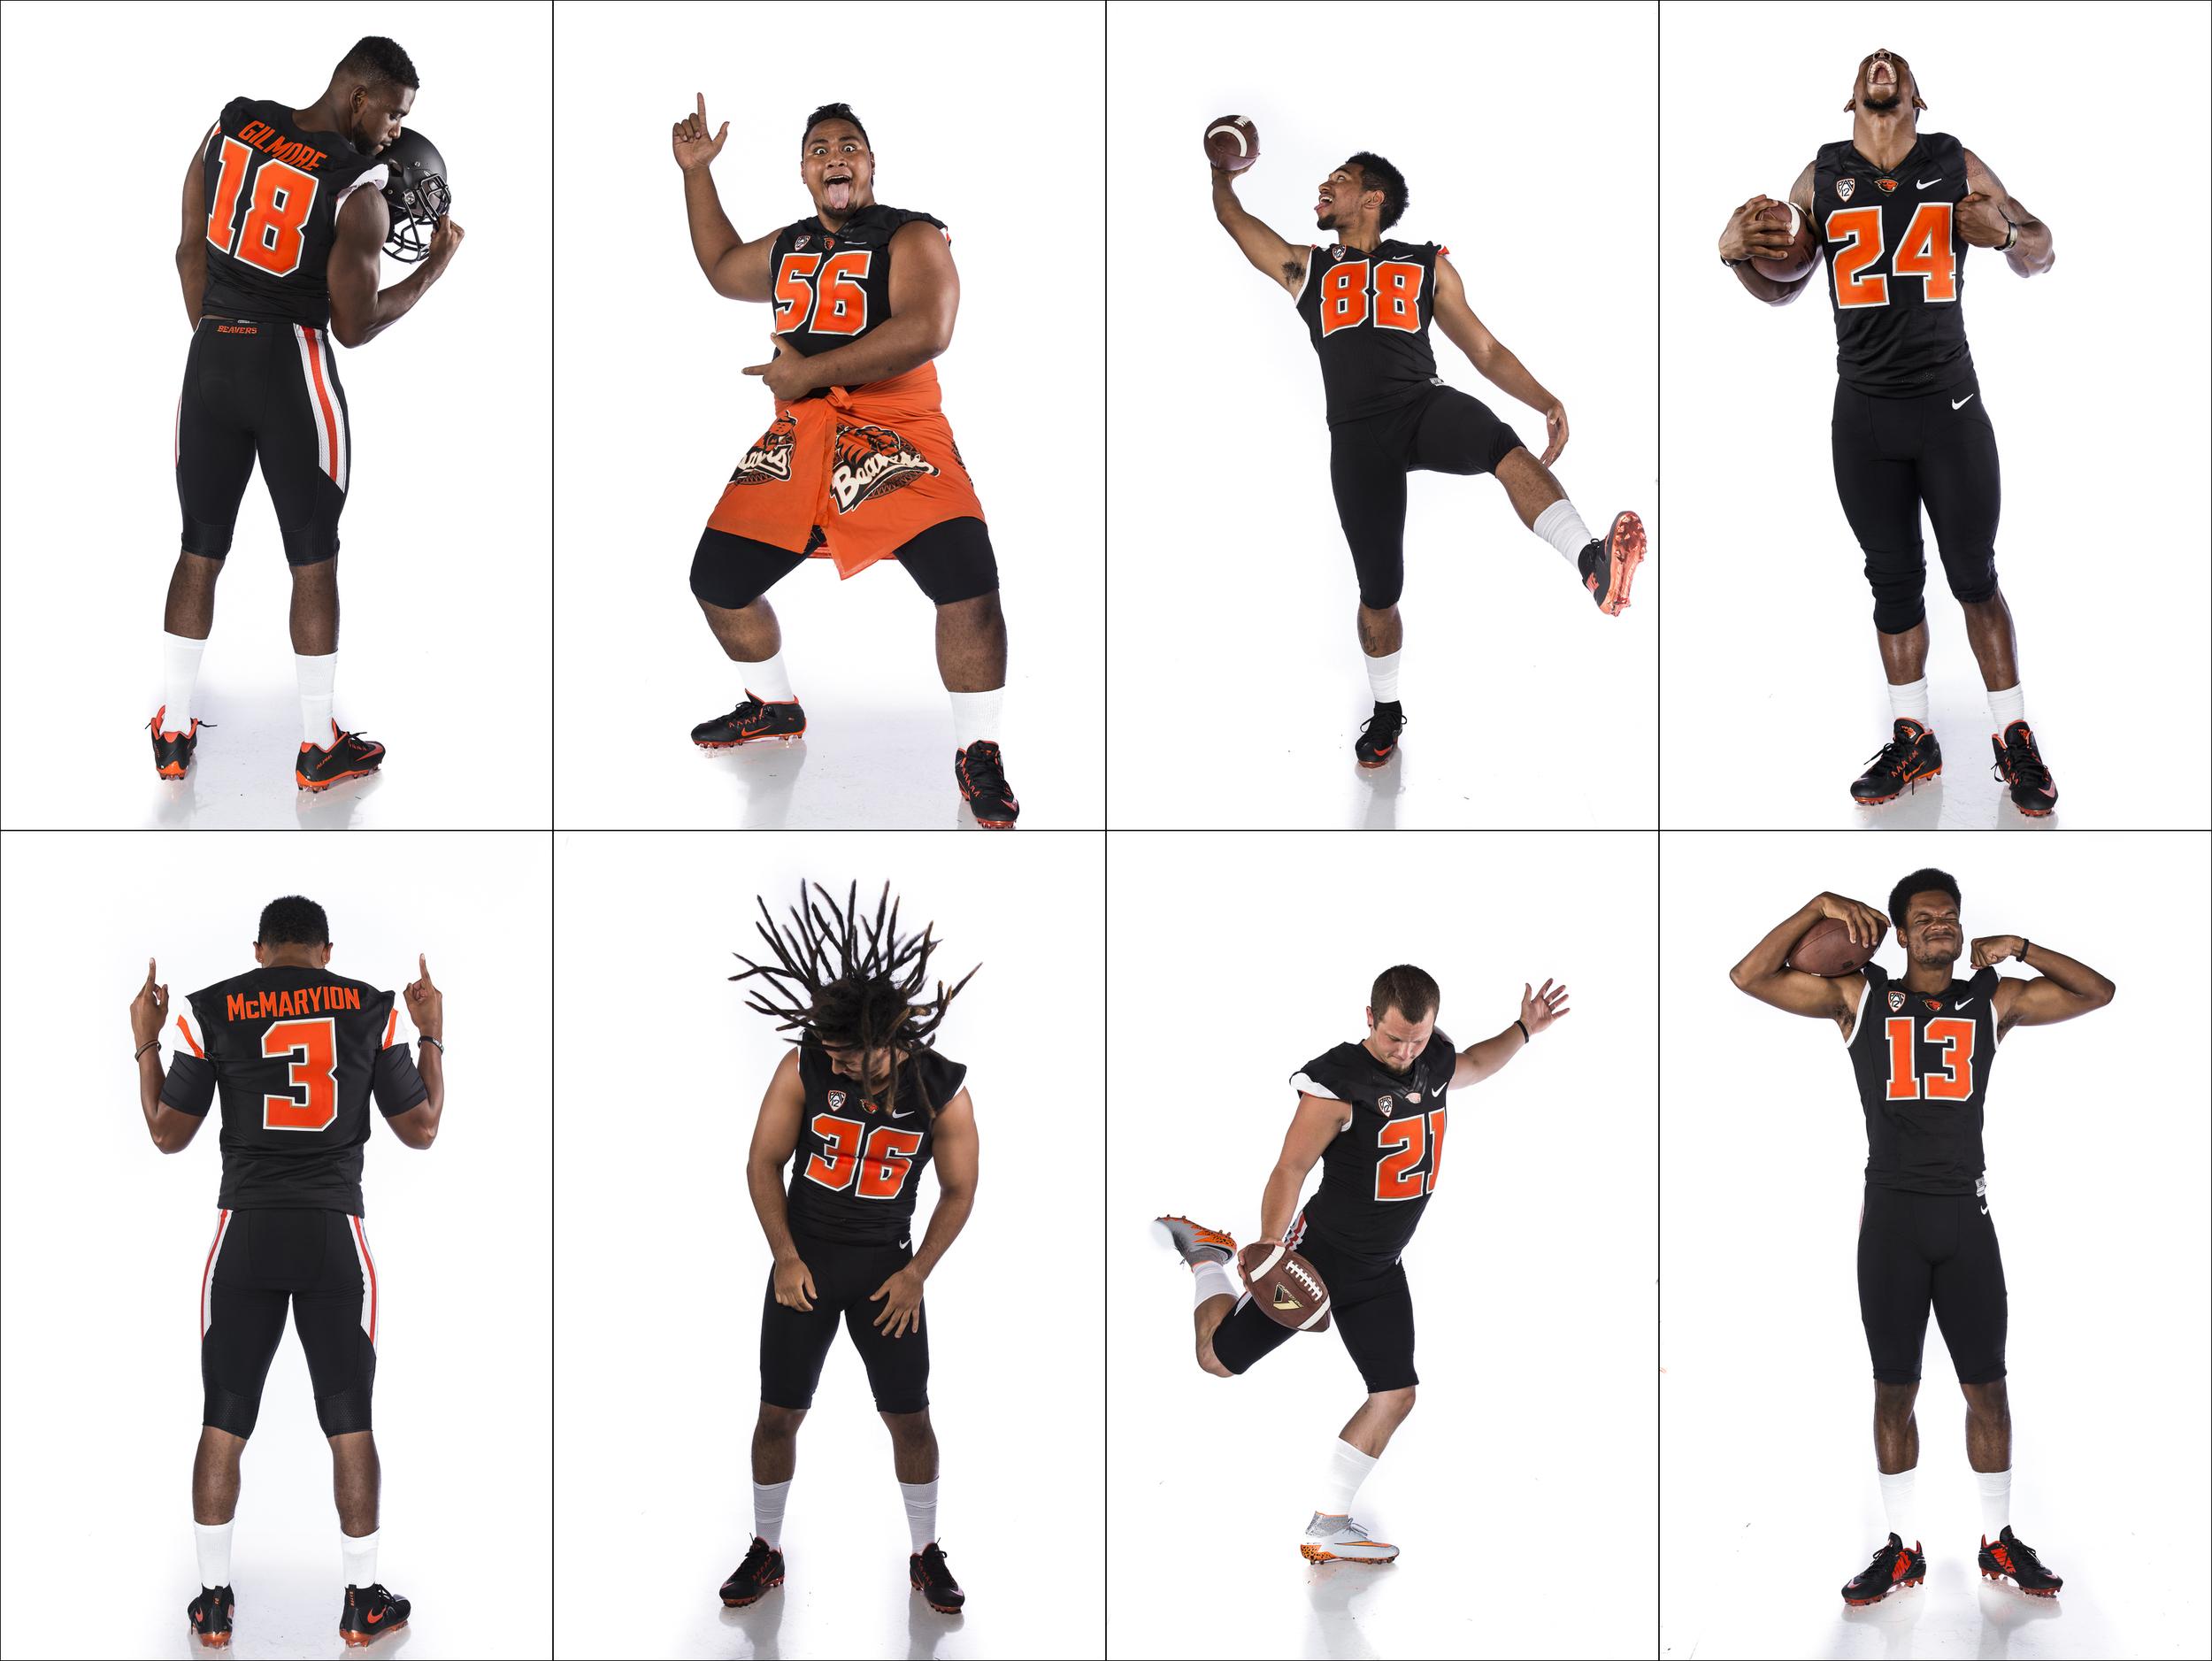 Oregon State Football players ham it up during photo shoot at Media Day. Top row L-R Malik Gilmore, Elu Aydon, Rahmel Dockery, Storm Barrs-Woods. Bottom Row L-R Marcus McMaryion, Ryan Navarro, Garrett Owens, and Jordan Villain.